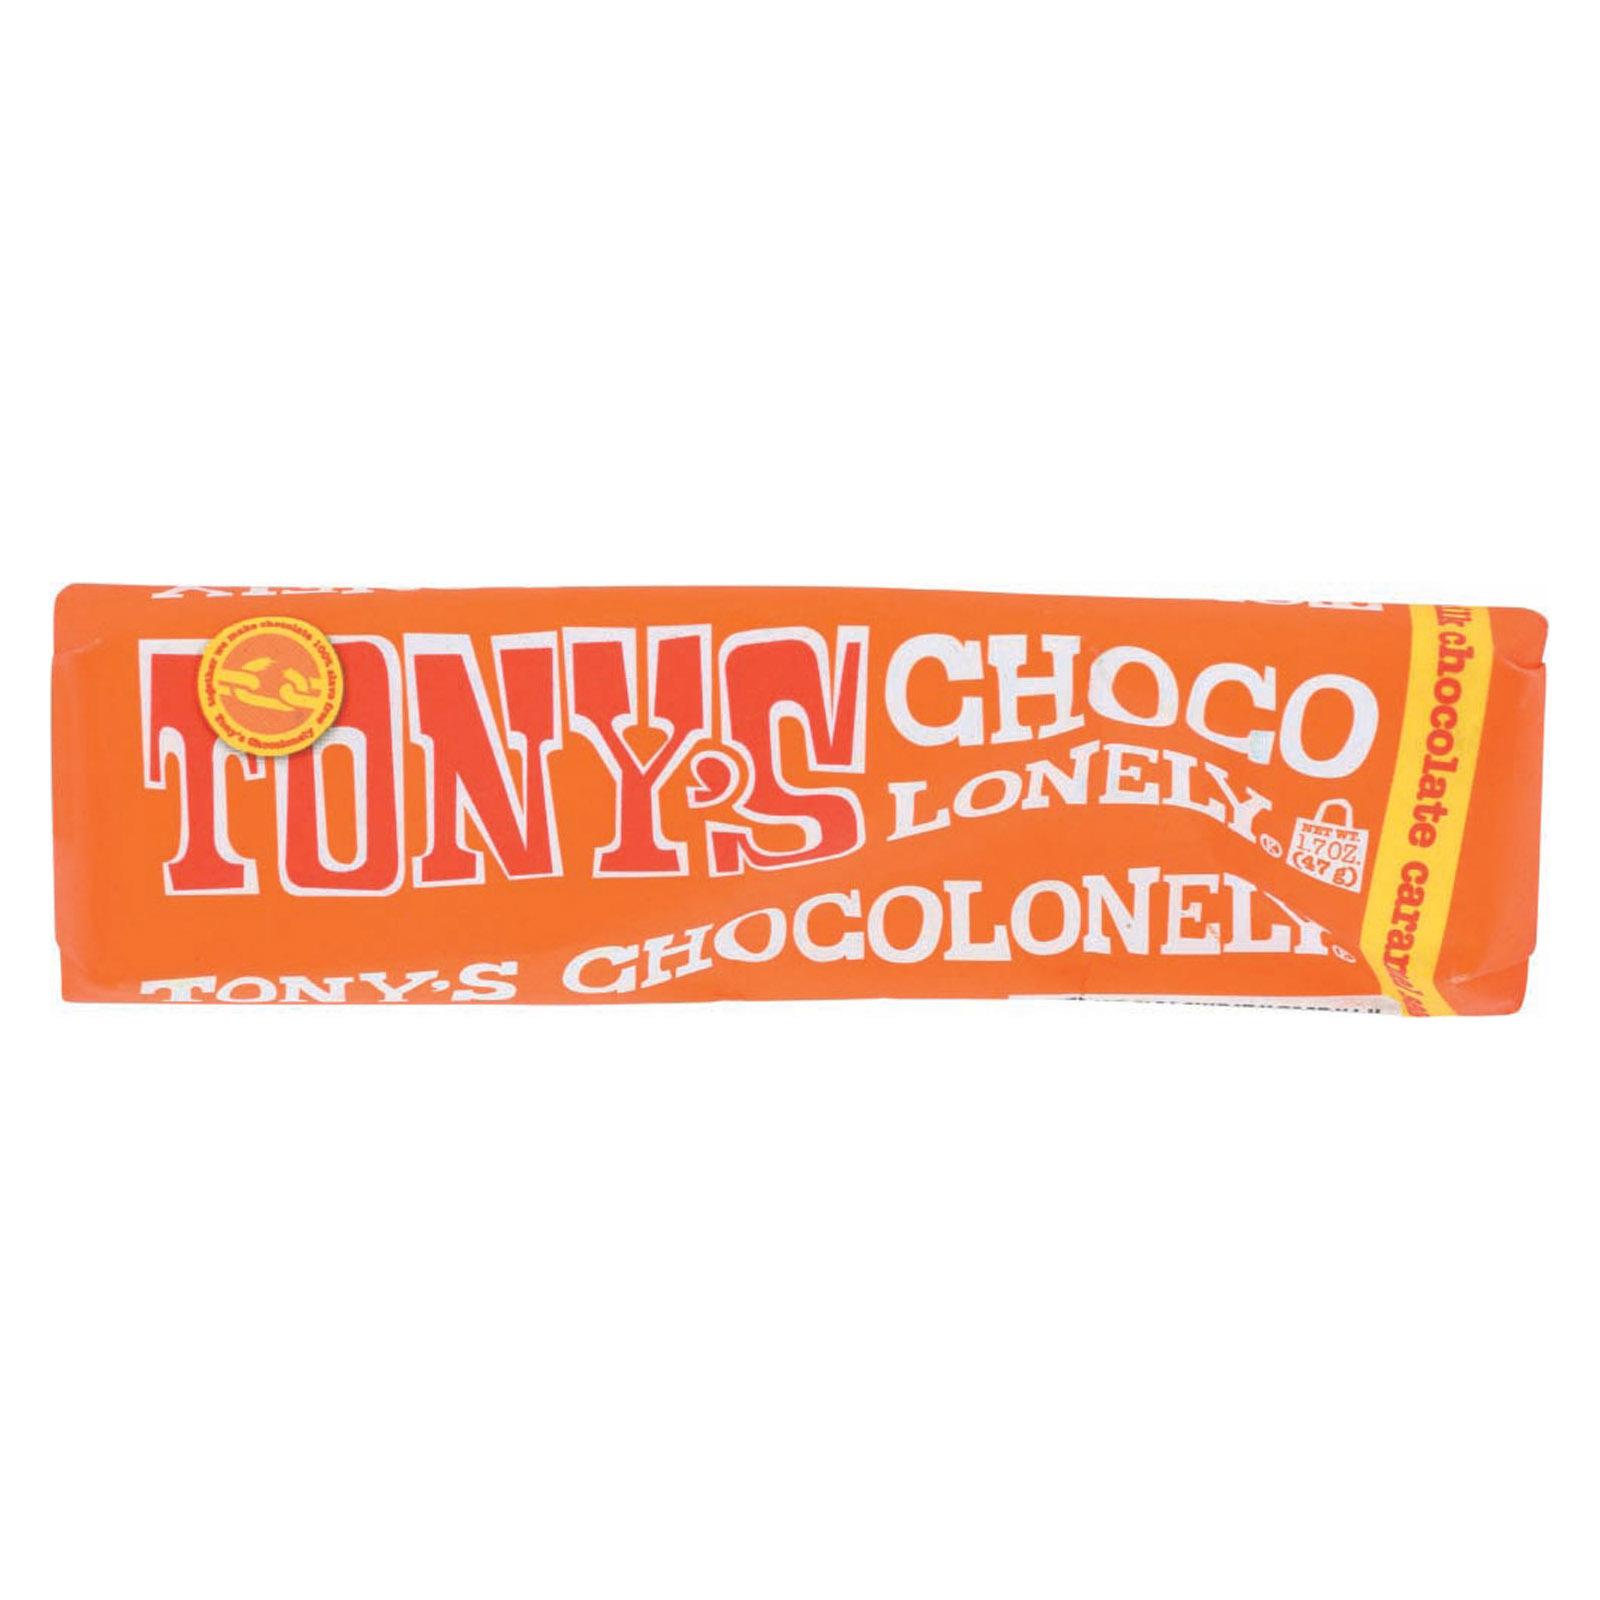 Tony's Chocolonely Bar - Milk Chocolate Caramel Sea Salt - Case of 35 - 1.7 oz.